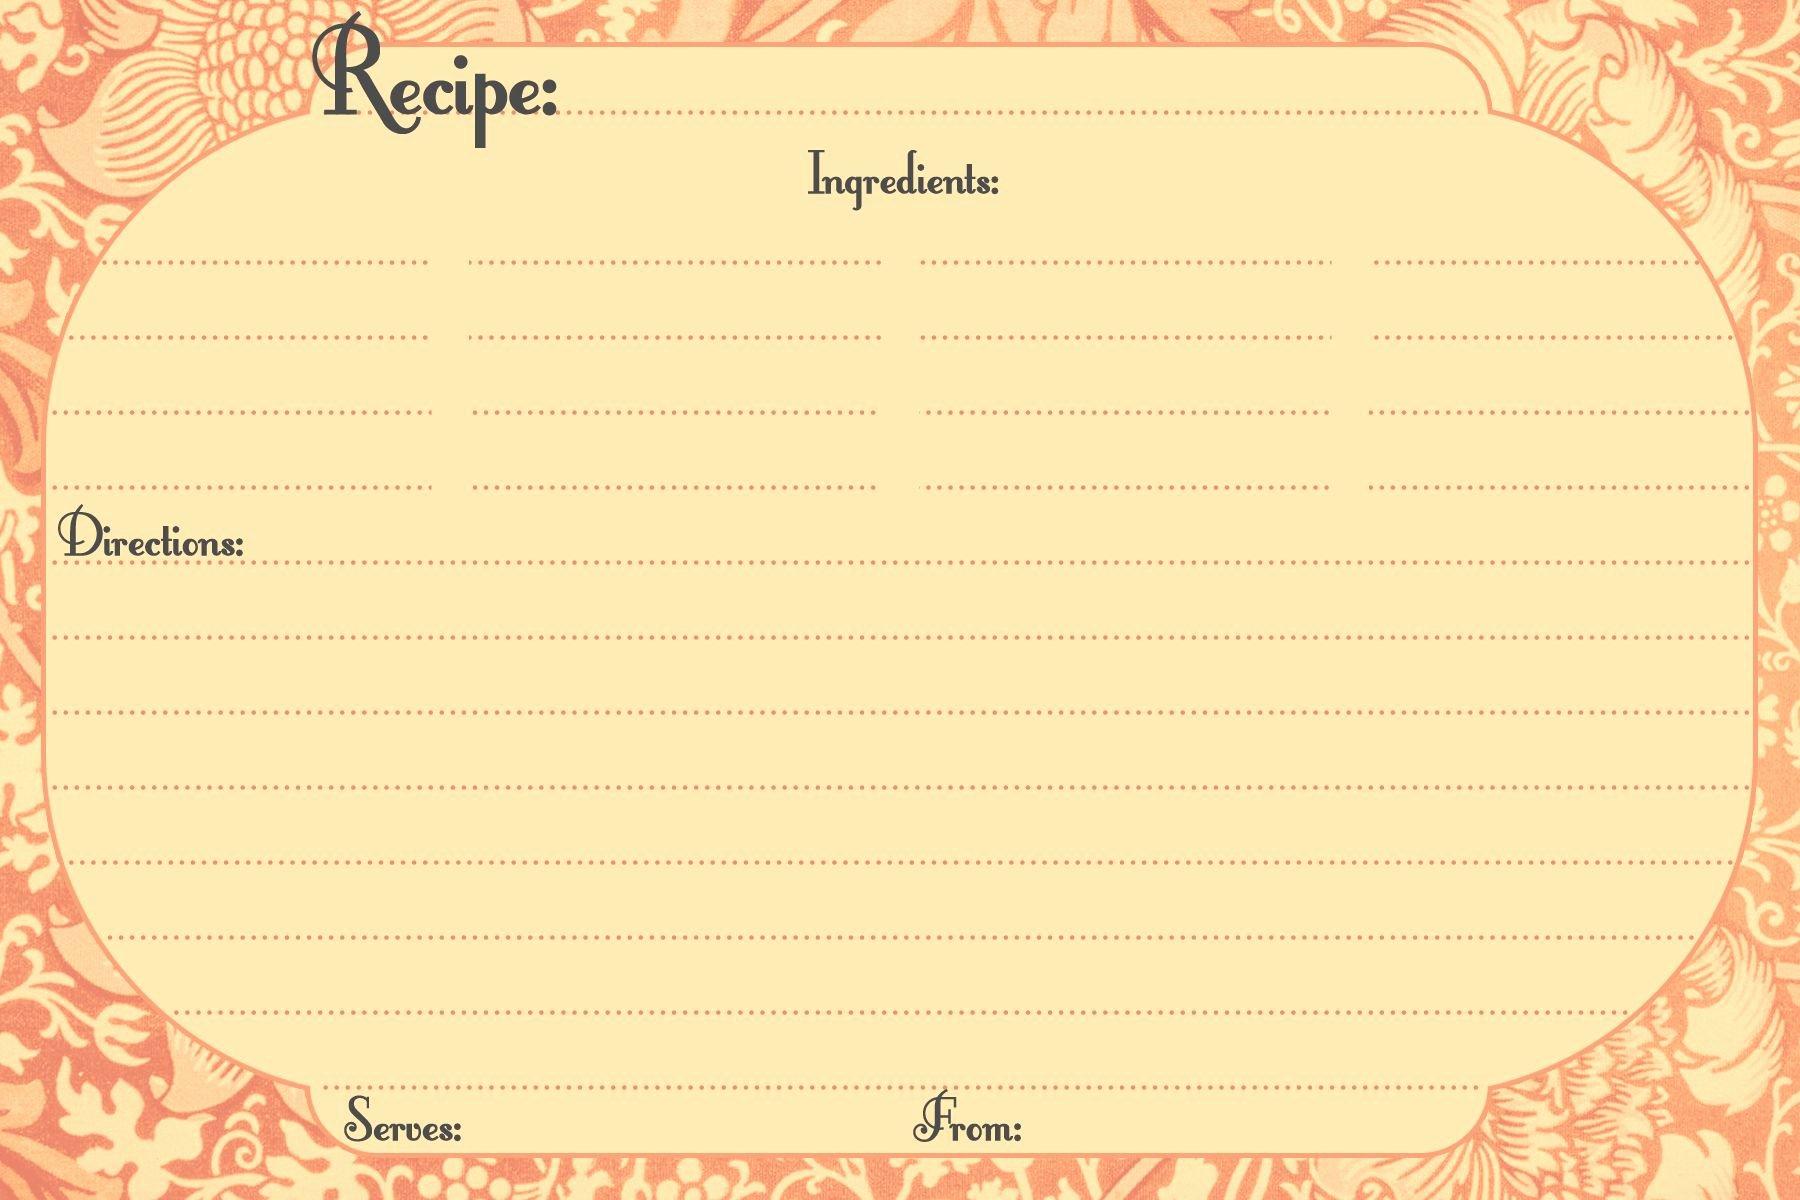 Recipe Template Google Docs Inspirational Recipe Templates Free Printable